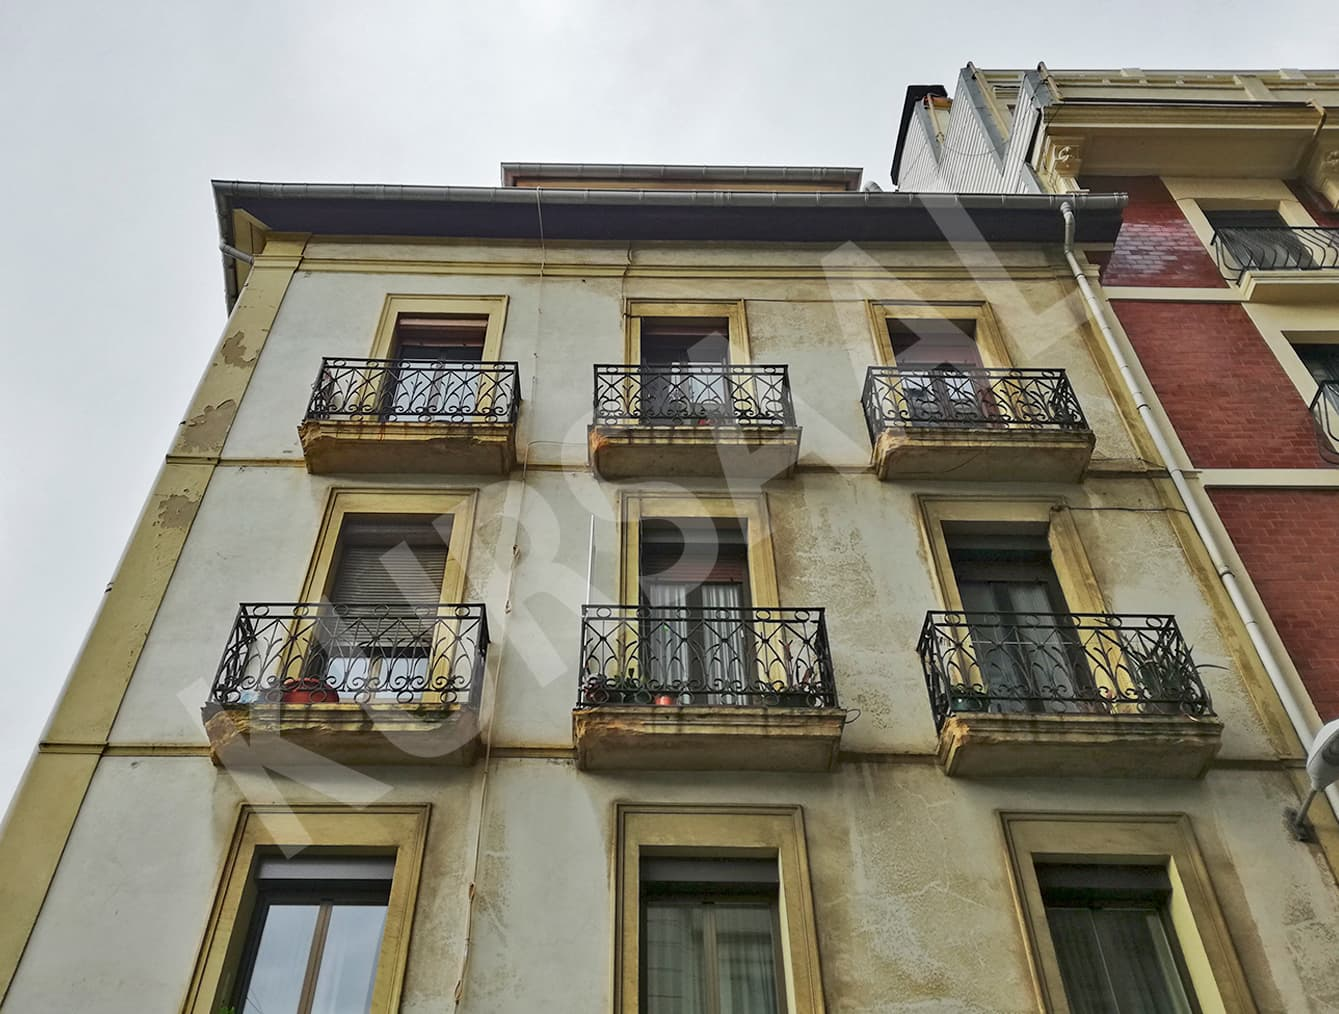 foto 1 - Restauración y patrimonio-Huertas, 4-DONOSTIA, GIPUZKOA